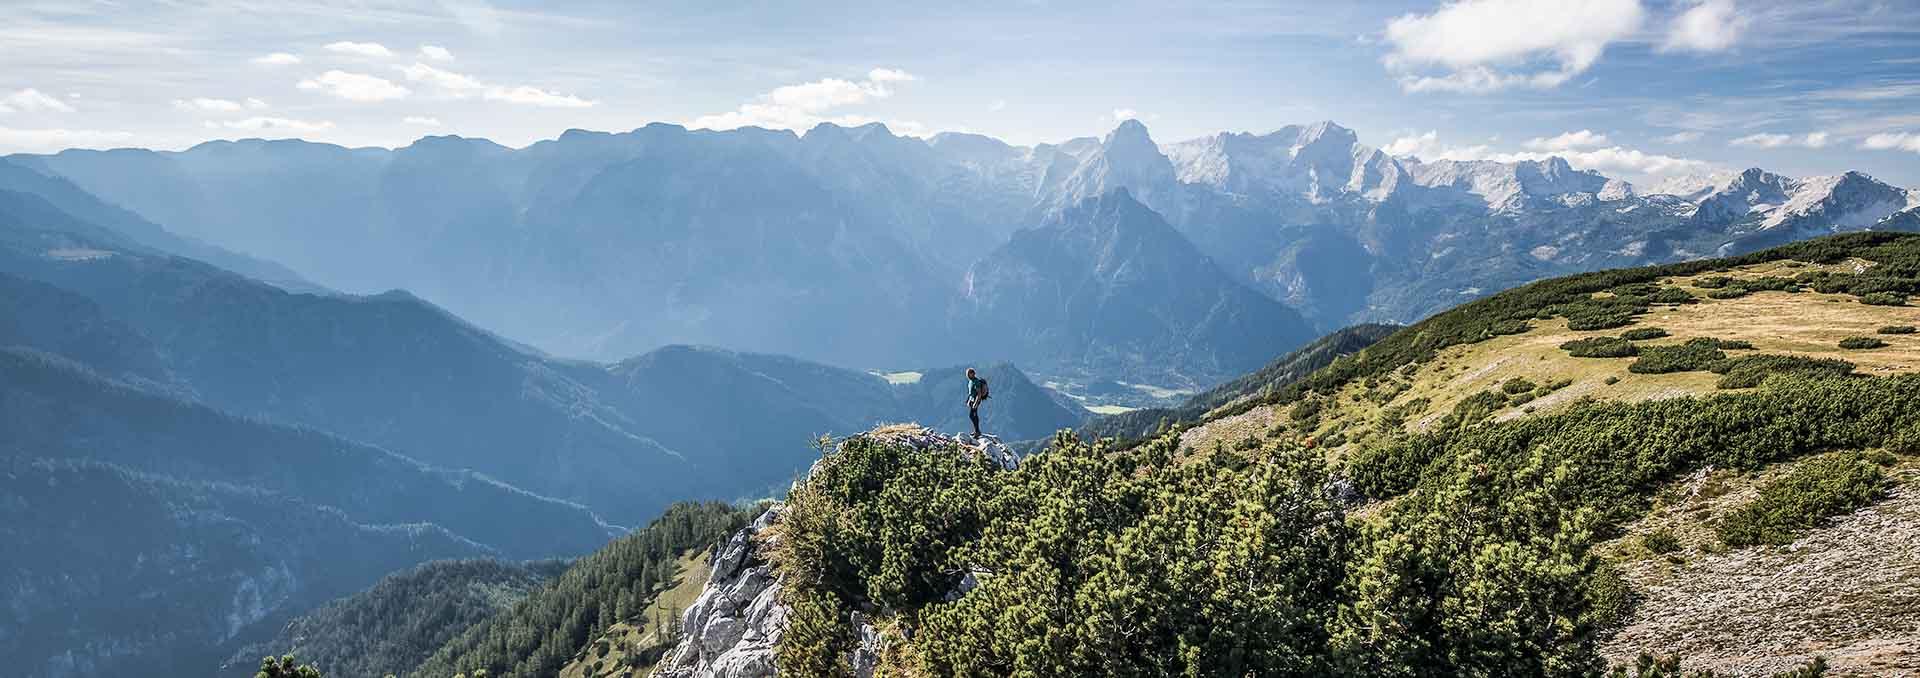 abenteuer-header-c-ooe-tourismus-gmbh-robert-maybach